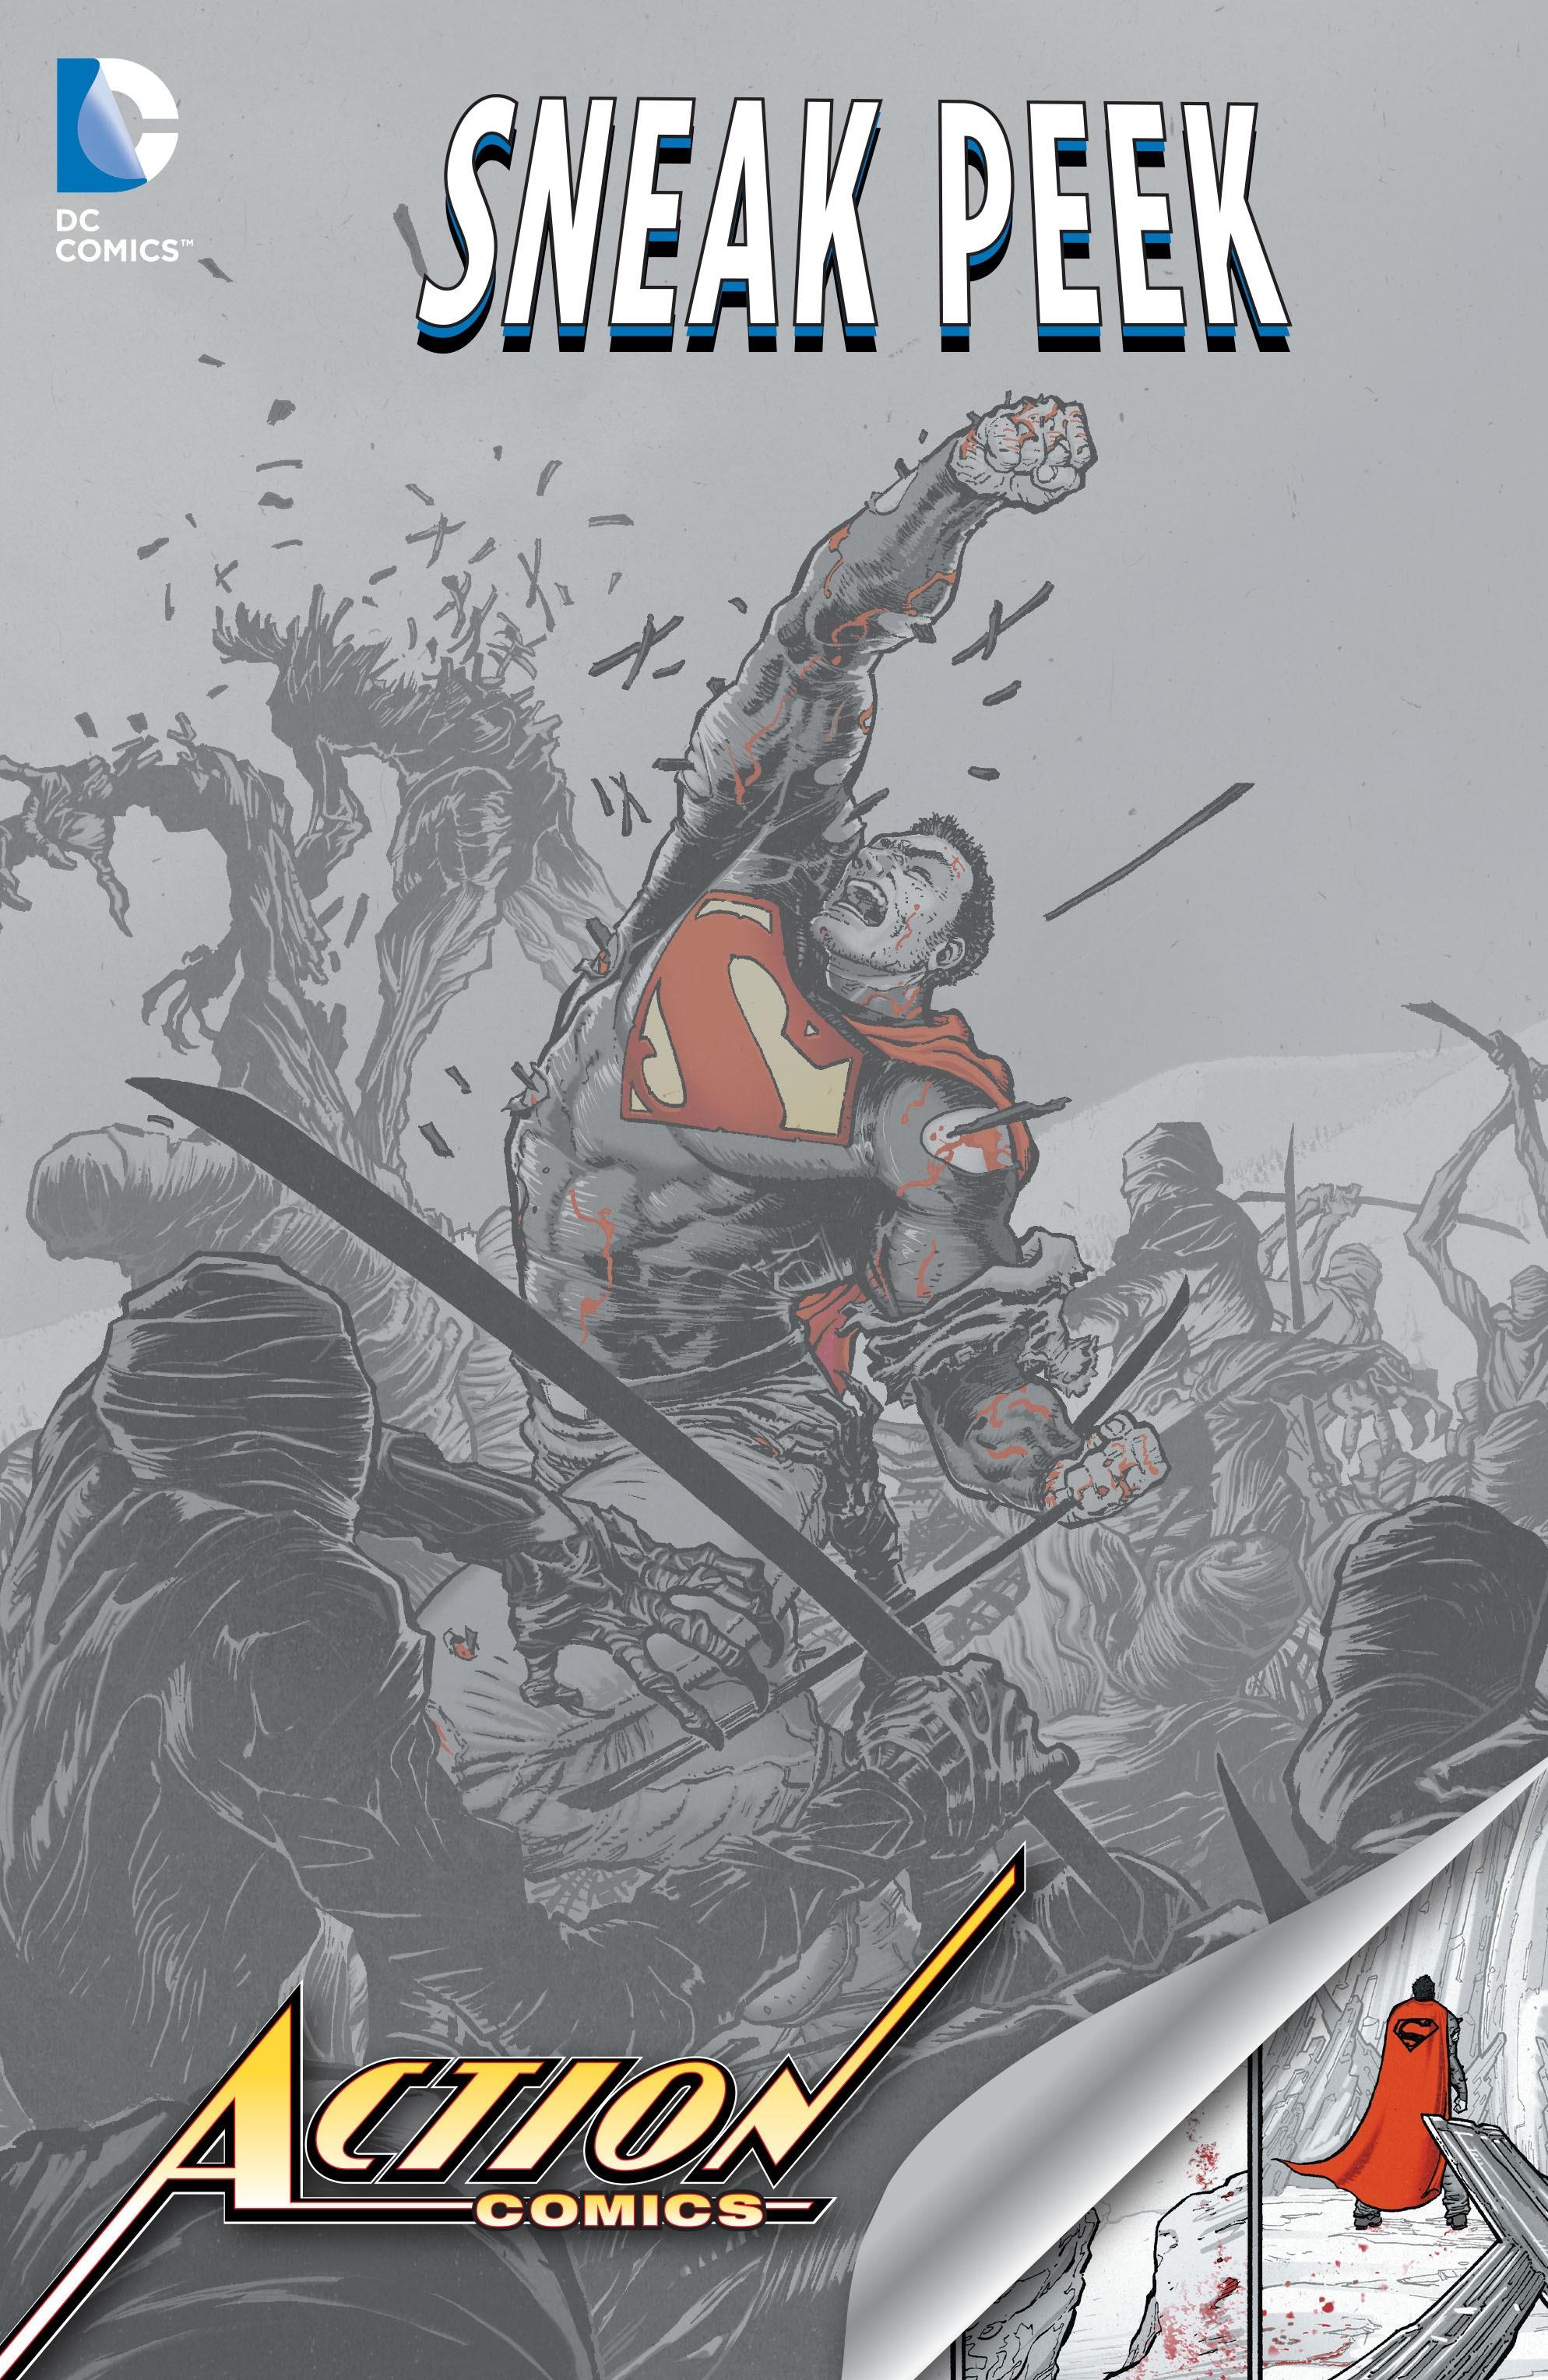 DC Sneak Peek: Action Comics Full Page 1